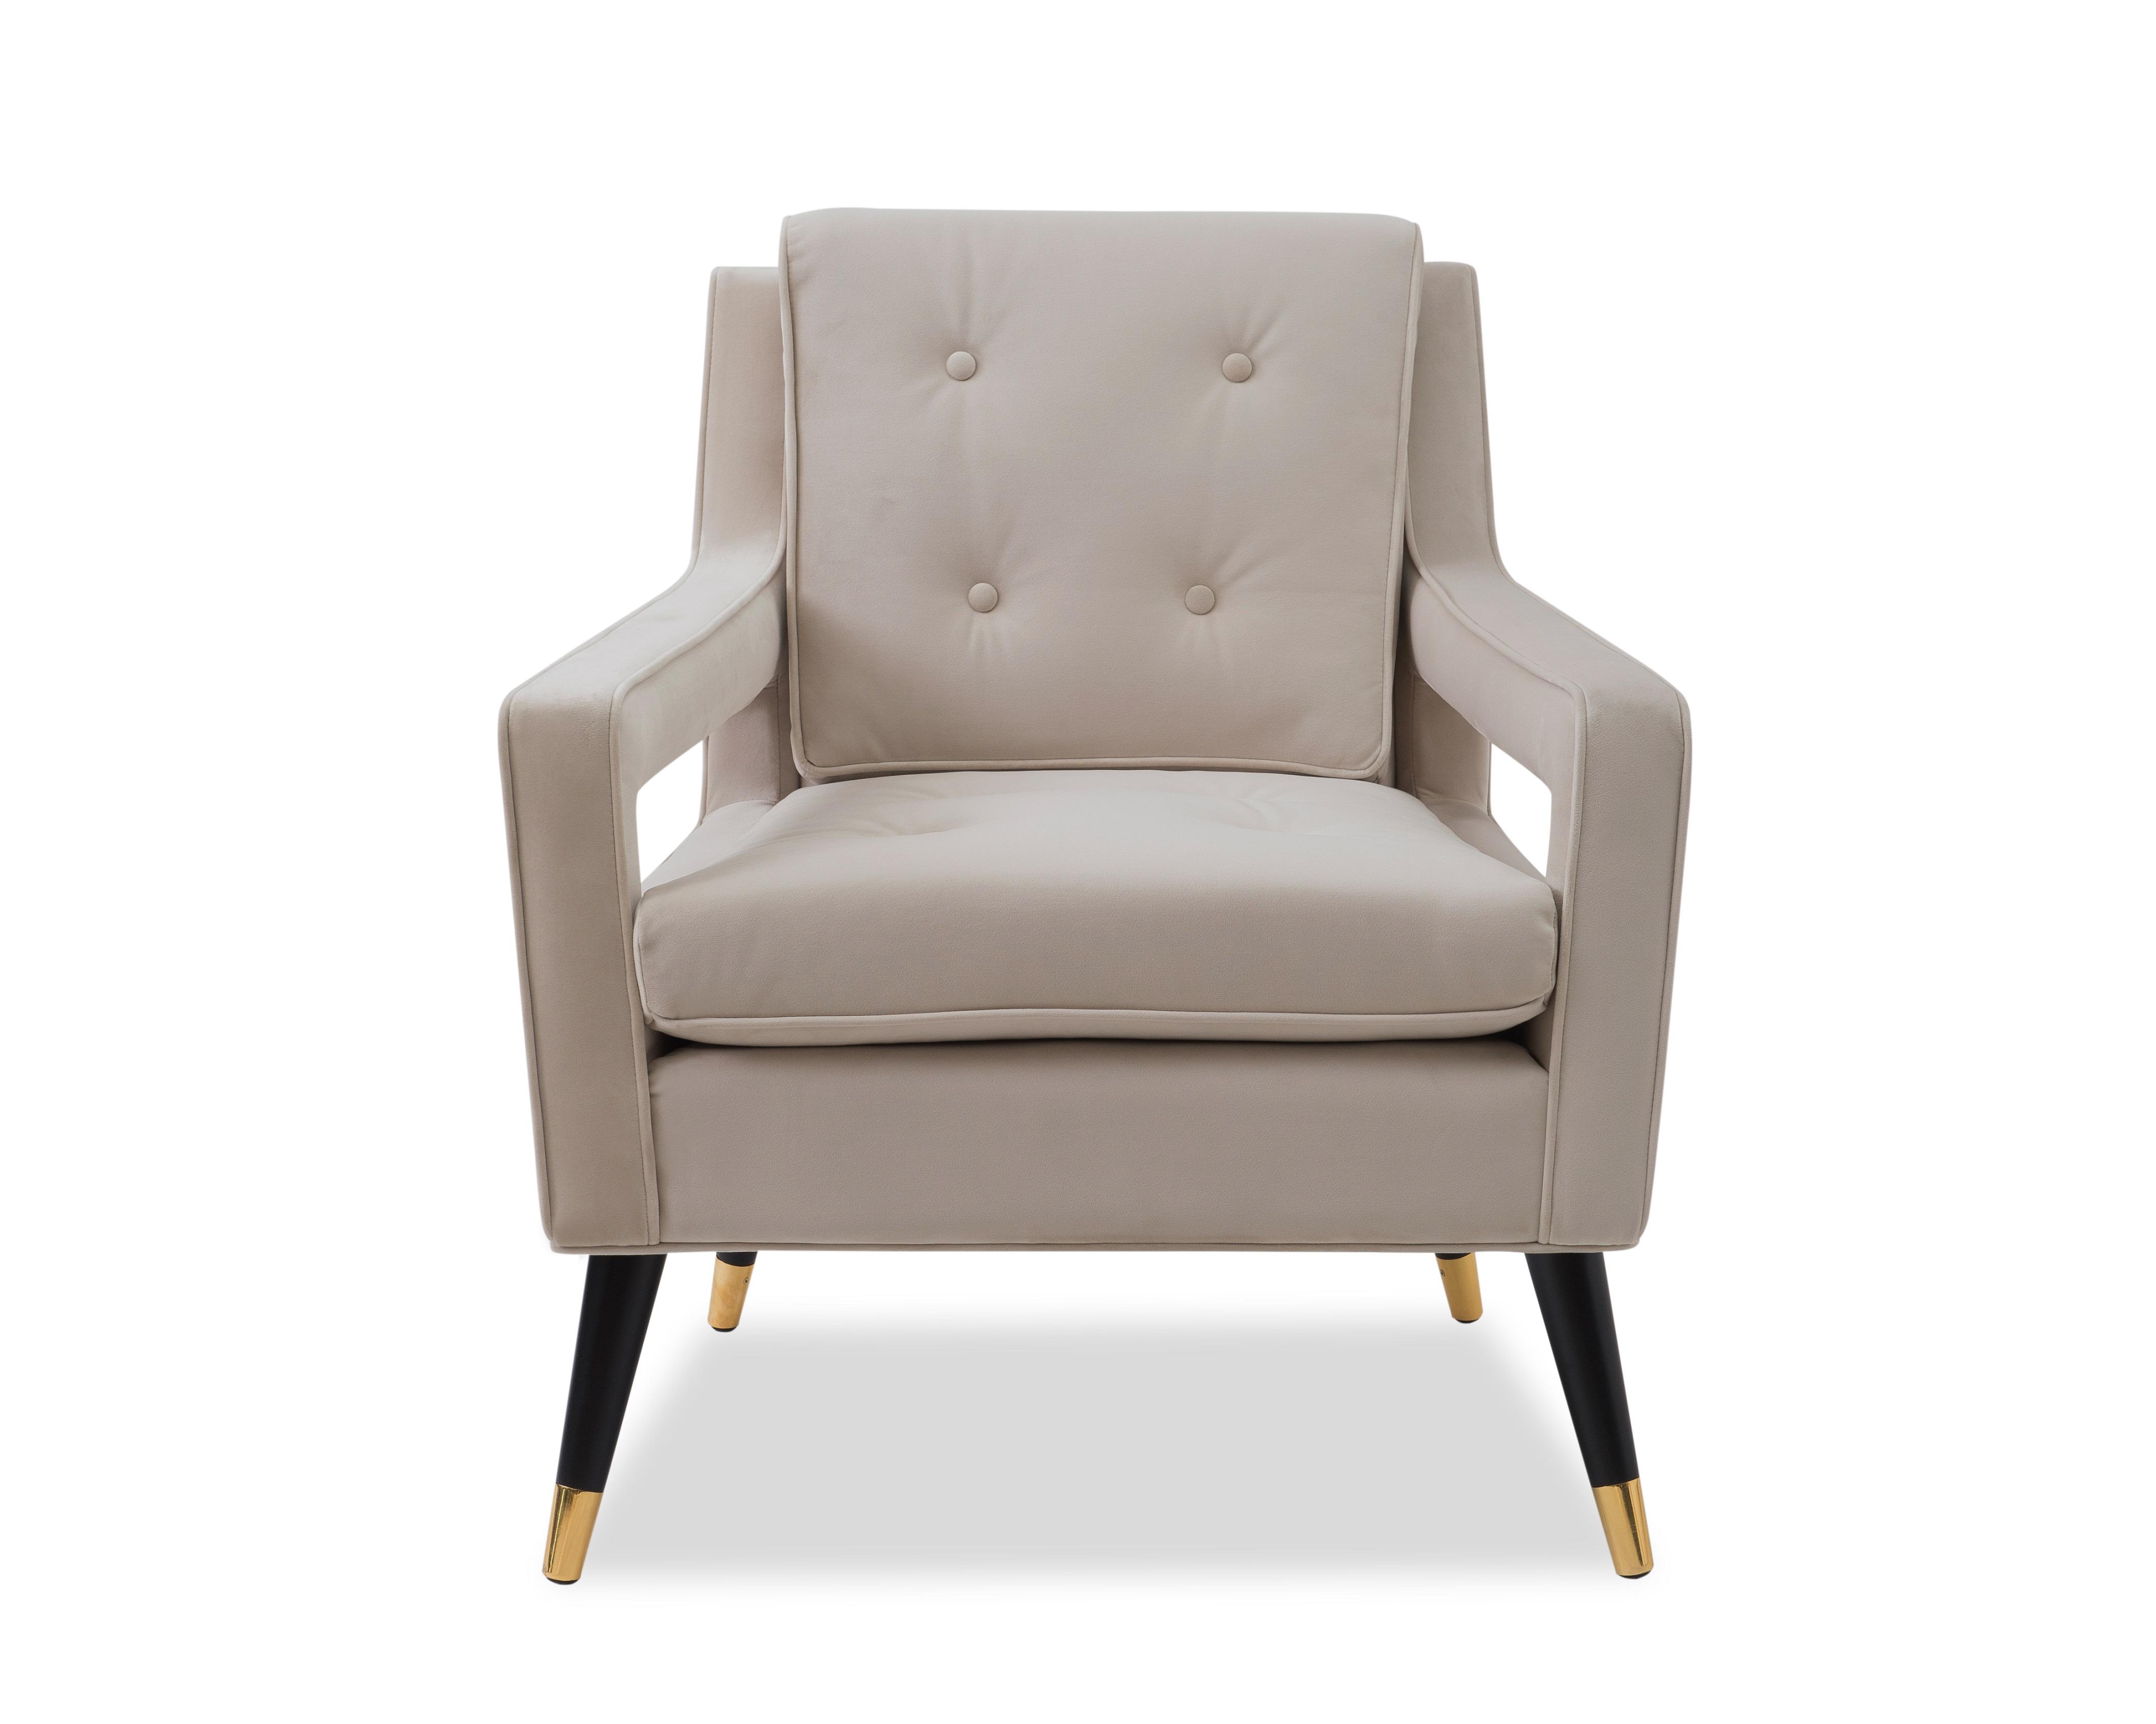 Liang & Eimil Edward Occasional Chair – Tan Beige Velvet (1)